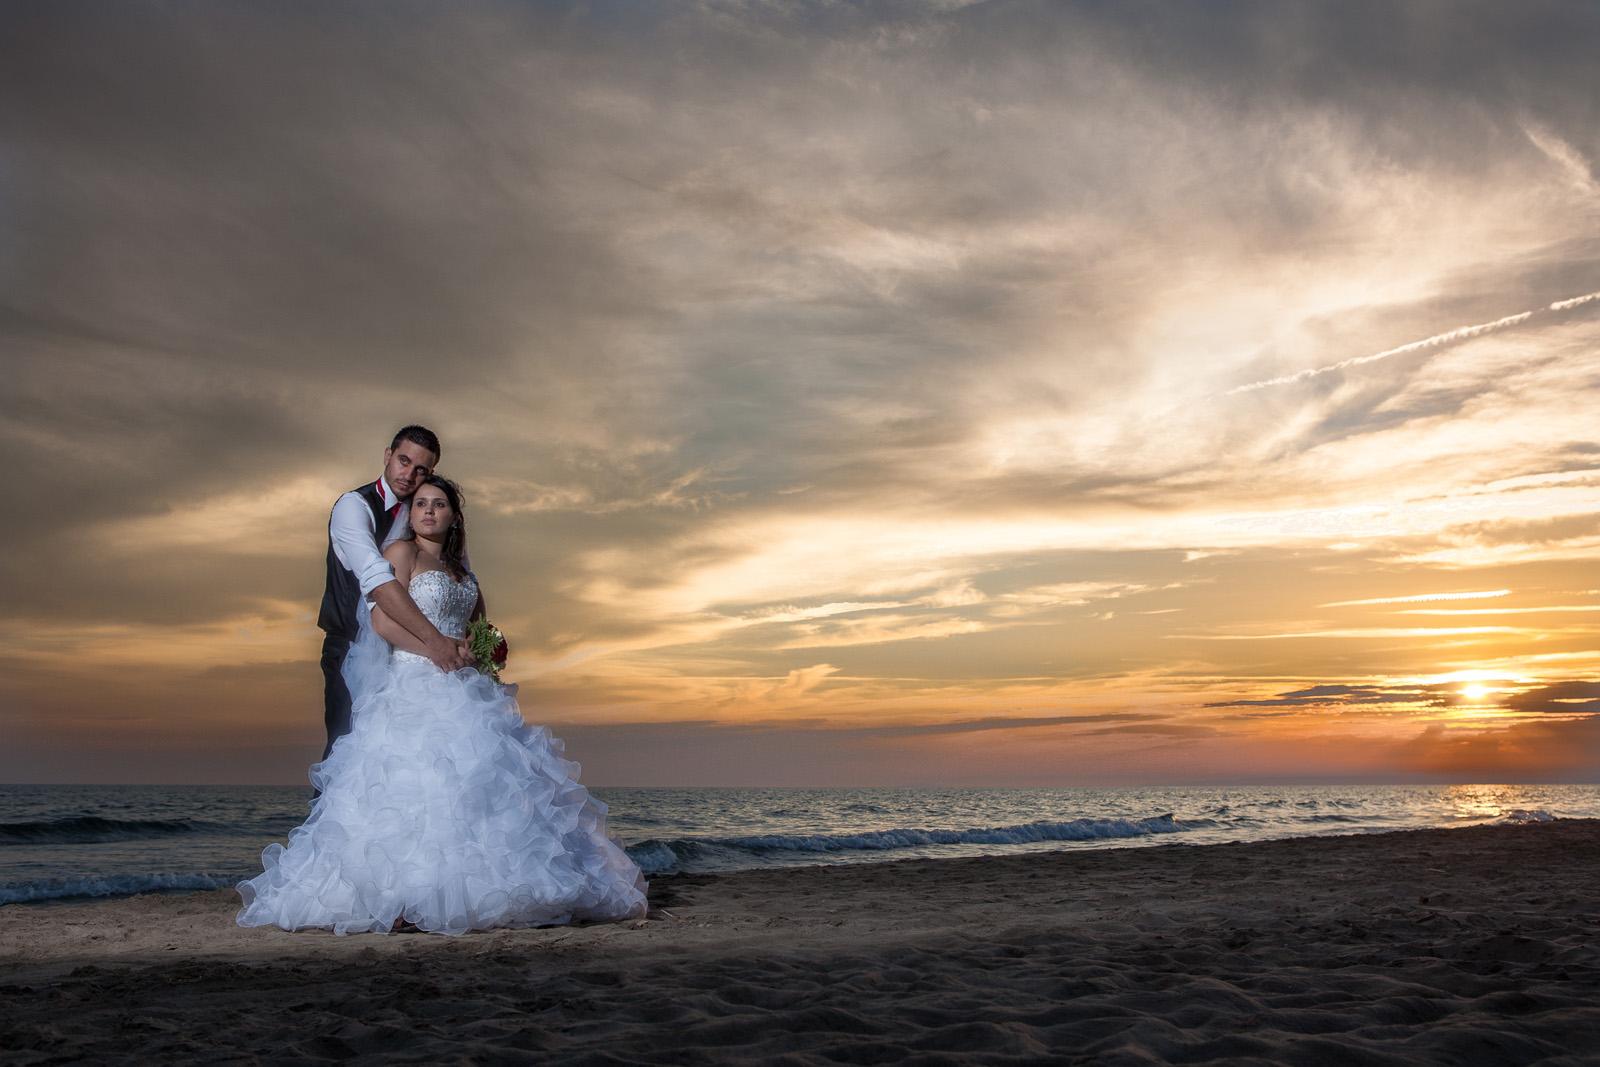 photographe mariage narbonne - Photographe Mariage Narbonne